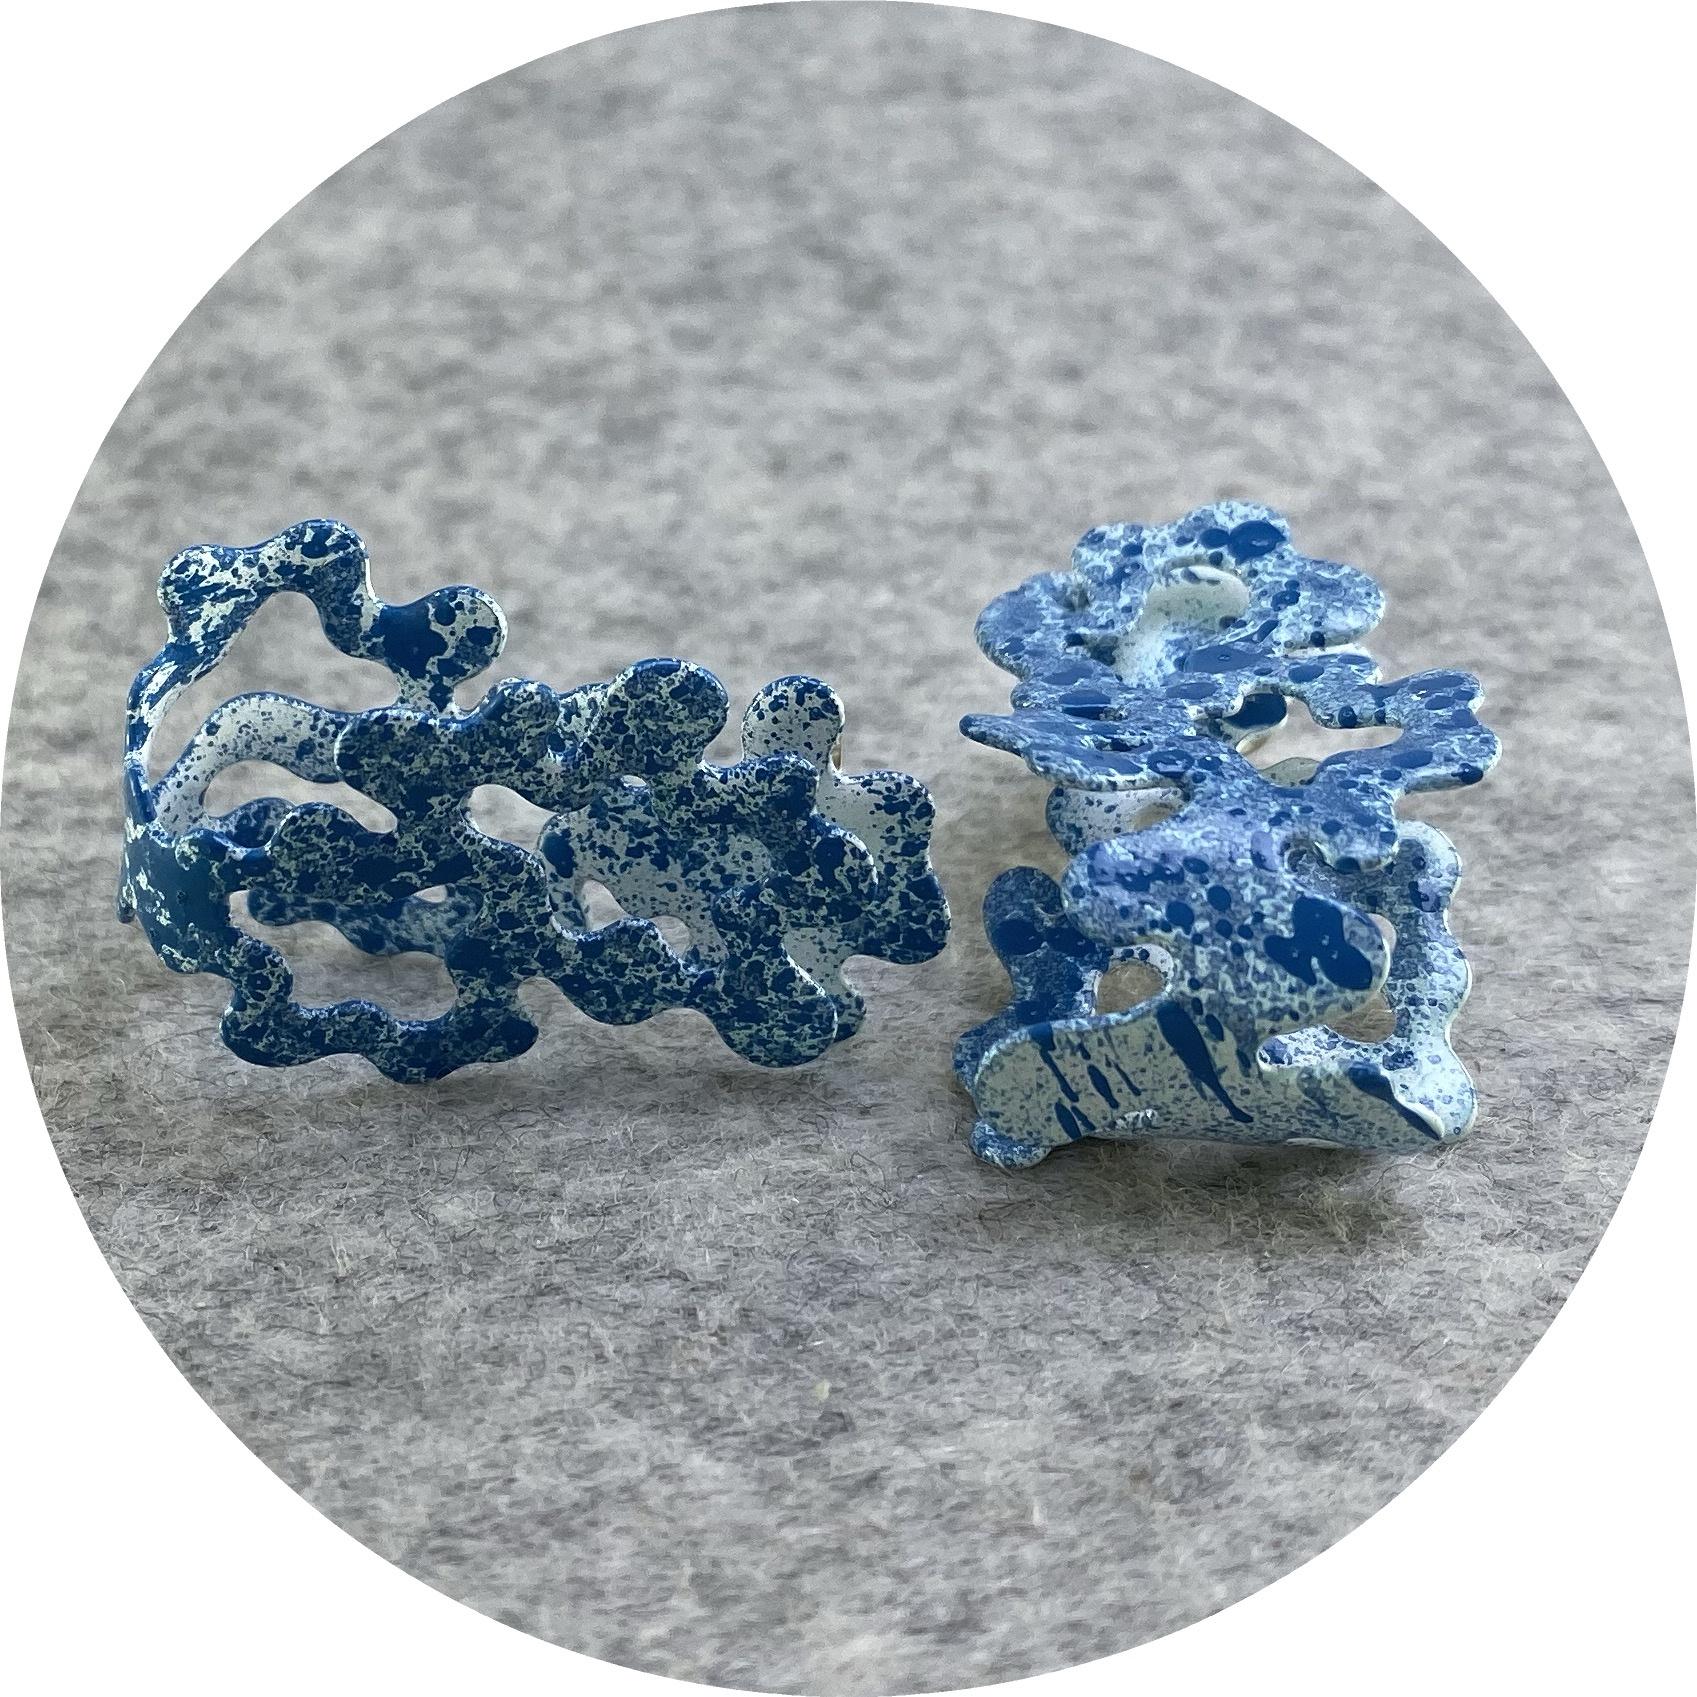 Cassandra Prinzi - 'Coral Clamshell Earrings Dark Blue on White', copper, powder coat, enamel paint, 925 silve